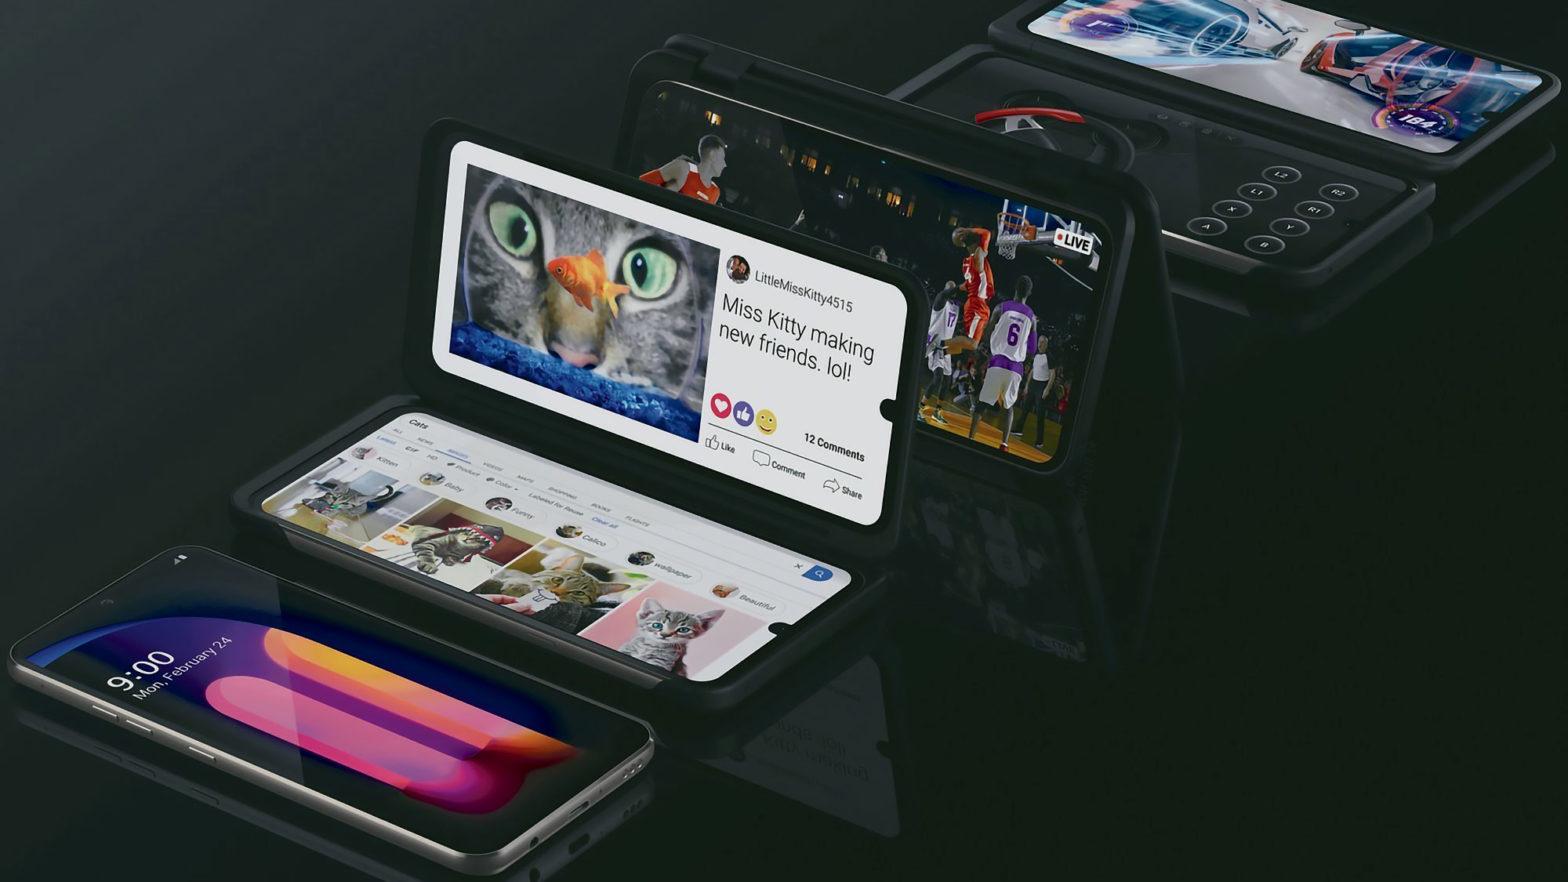 LG V60 ThinQ 5G with LG Dual Screen Smartphone